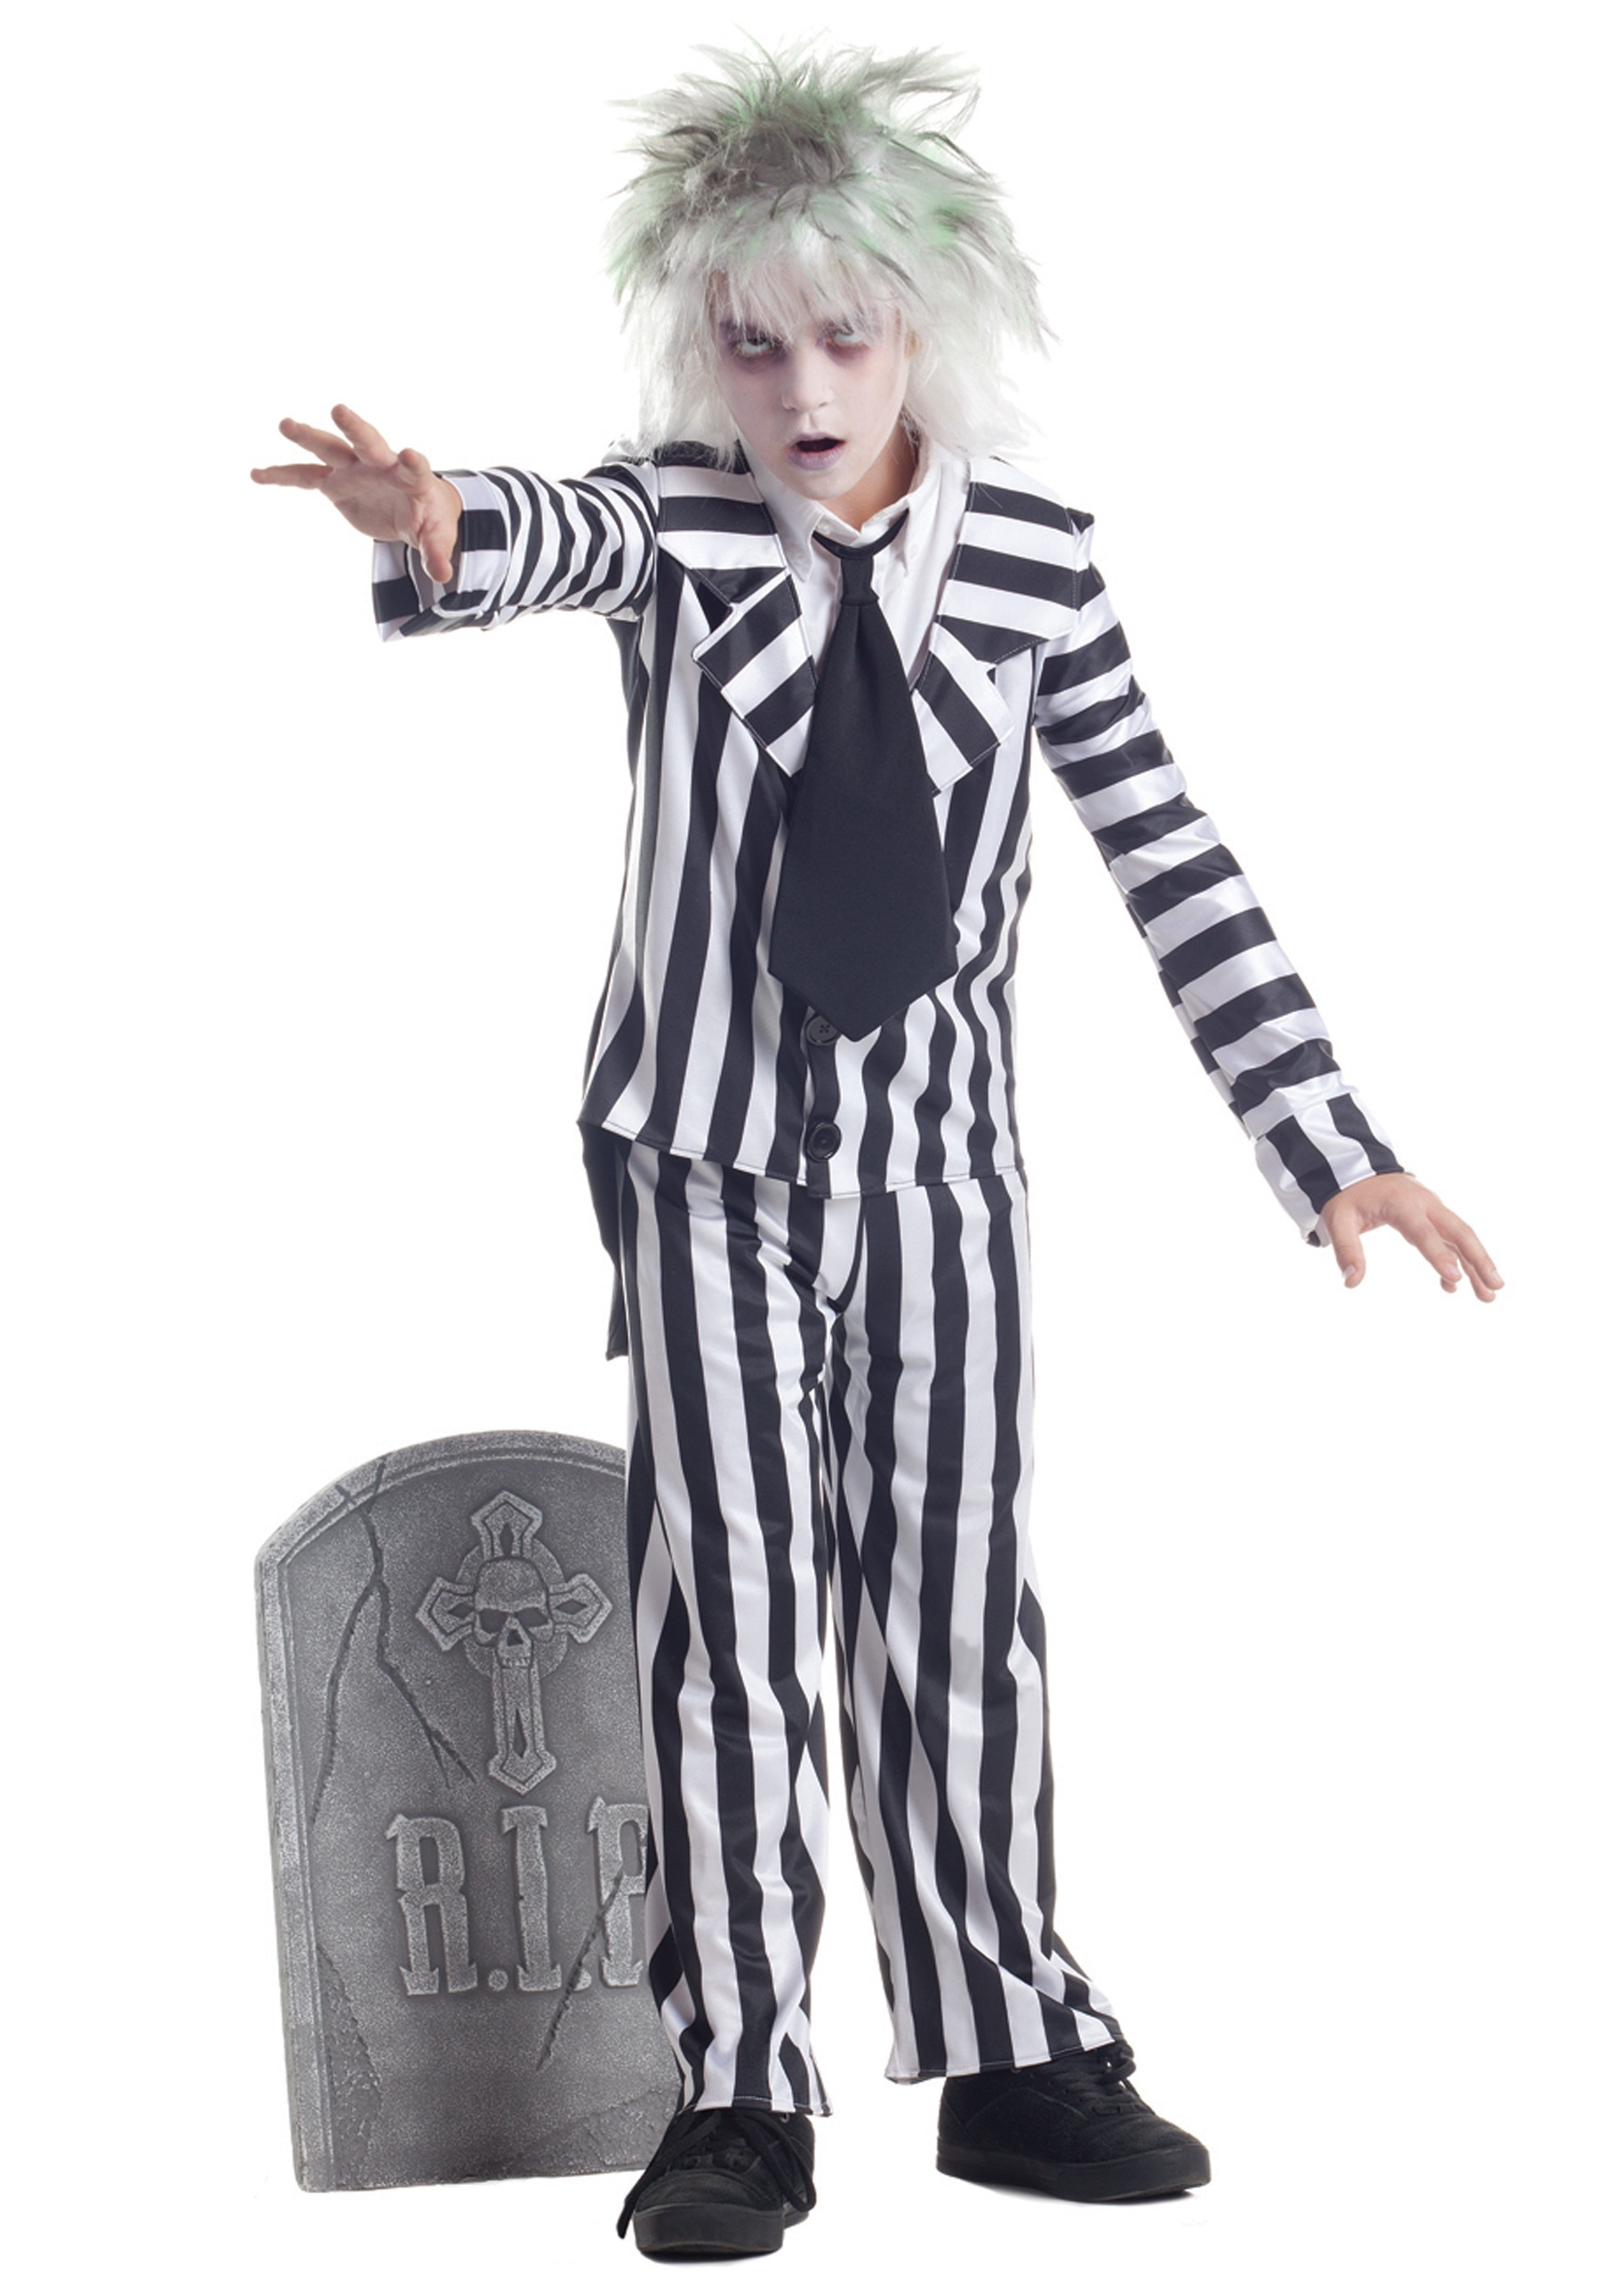 Child Graveyard Ghost Costume Halloween Costume Ideas 2019